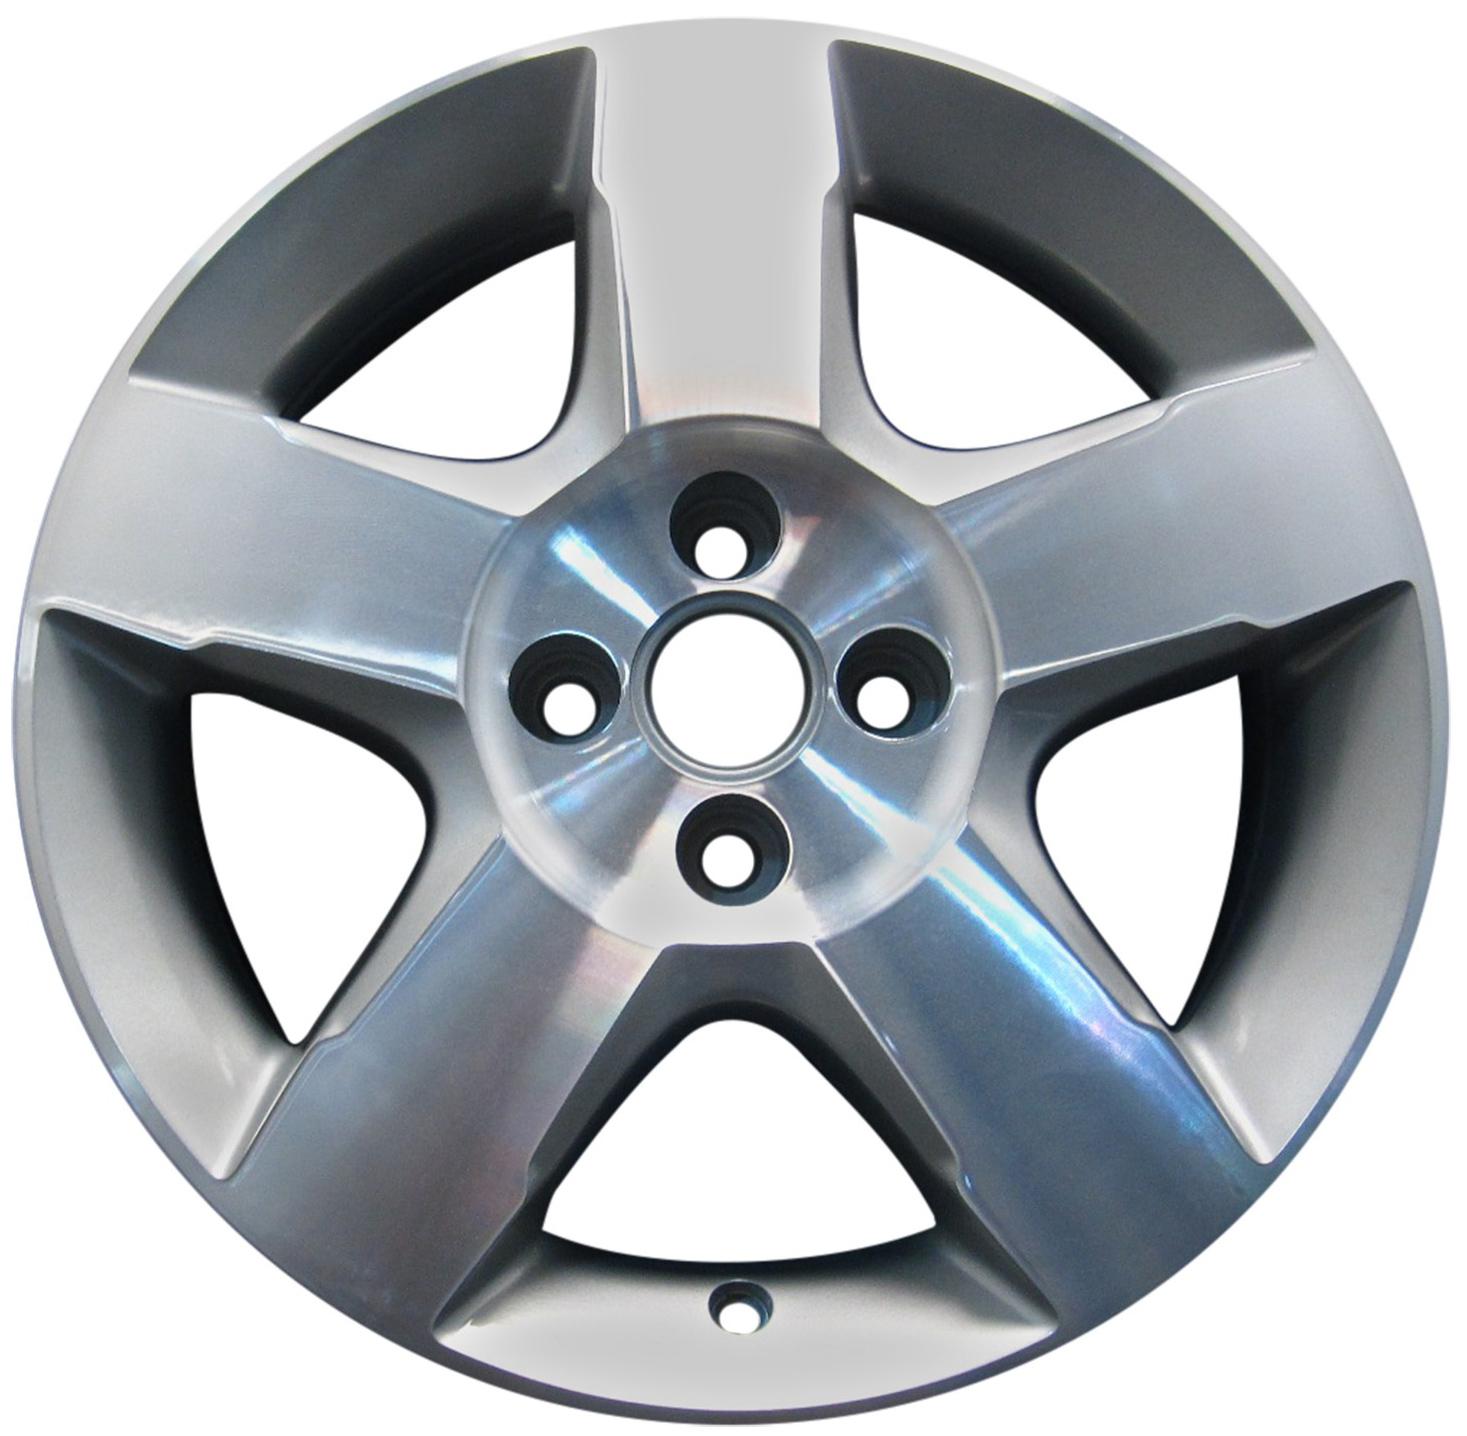 07044 chevrolet cobalt 2005 2010 16 inch new compatible wheel rim. Black Bedroom Furniture Sets. Home Design Ideas